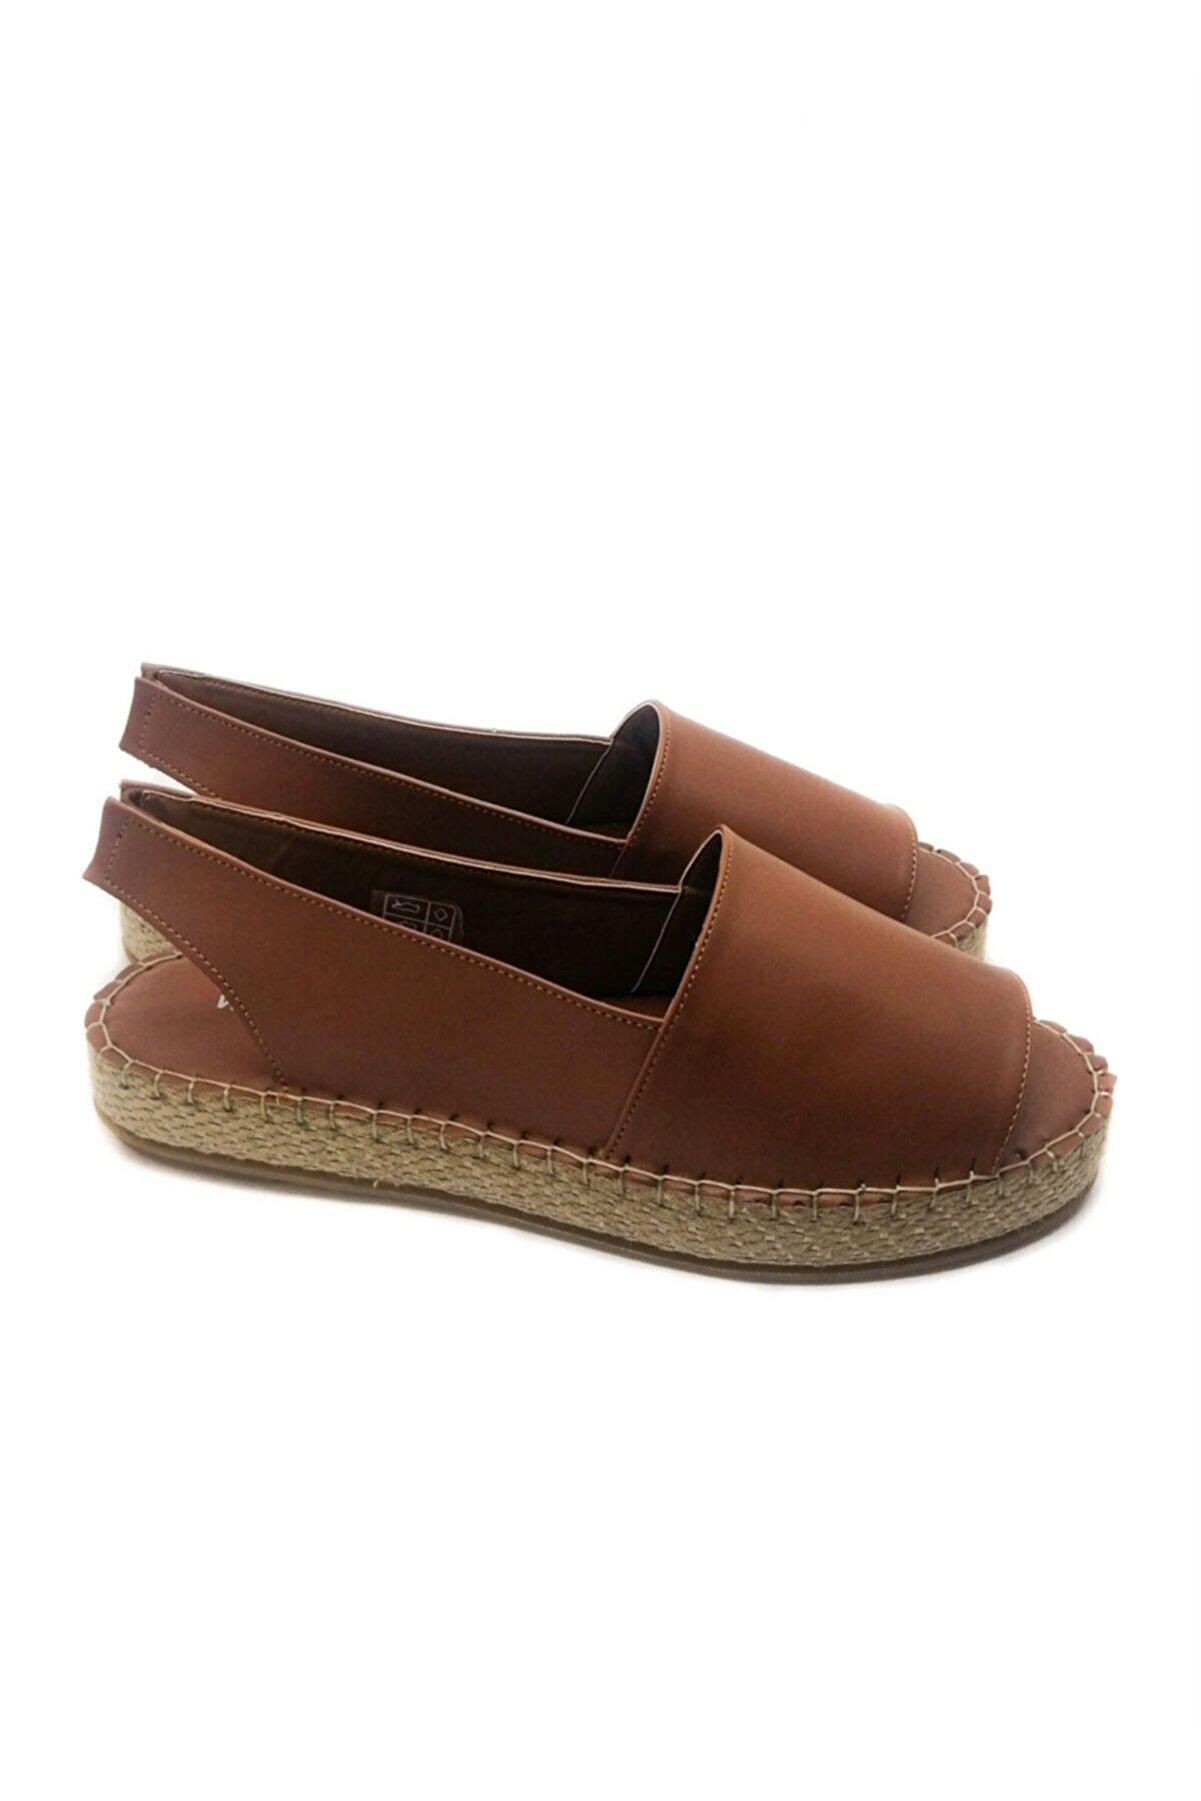 WHİTE LİNE Kadın Kahverengi Cilt Sandalet